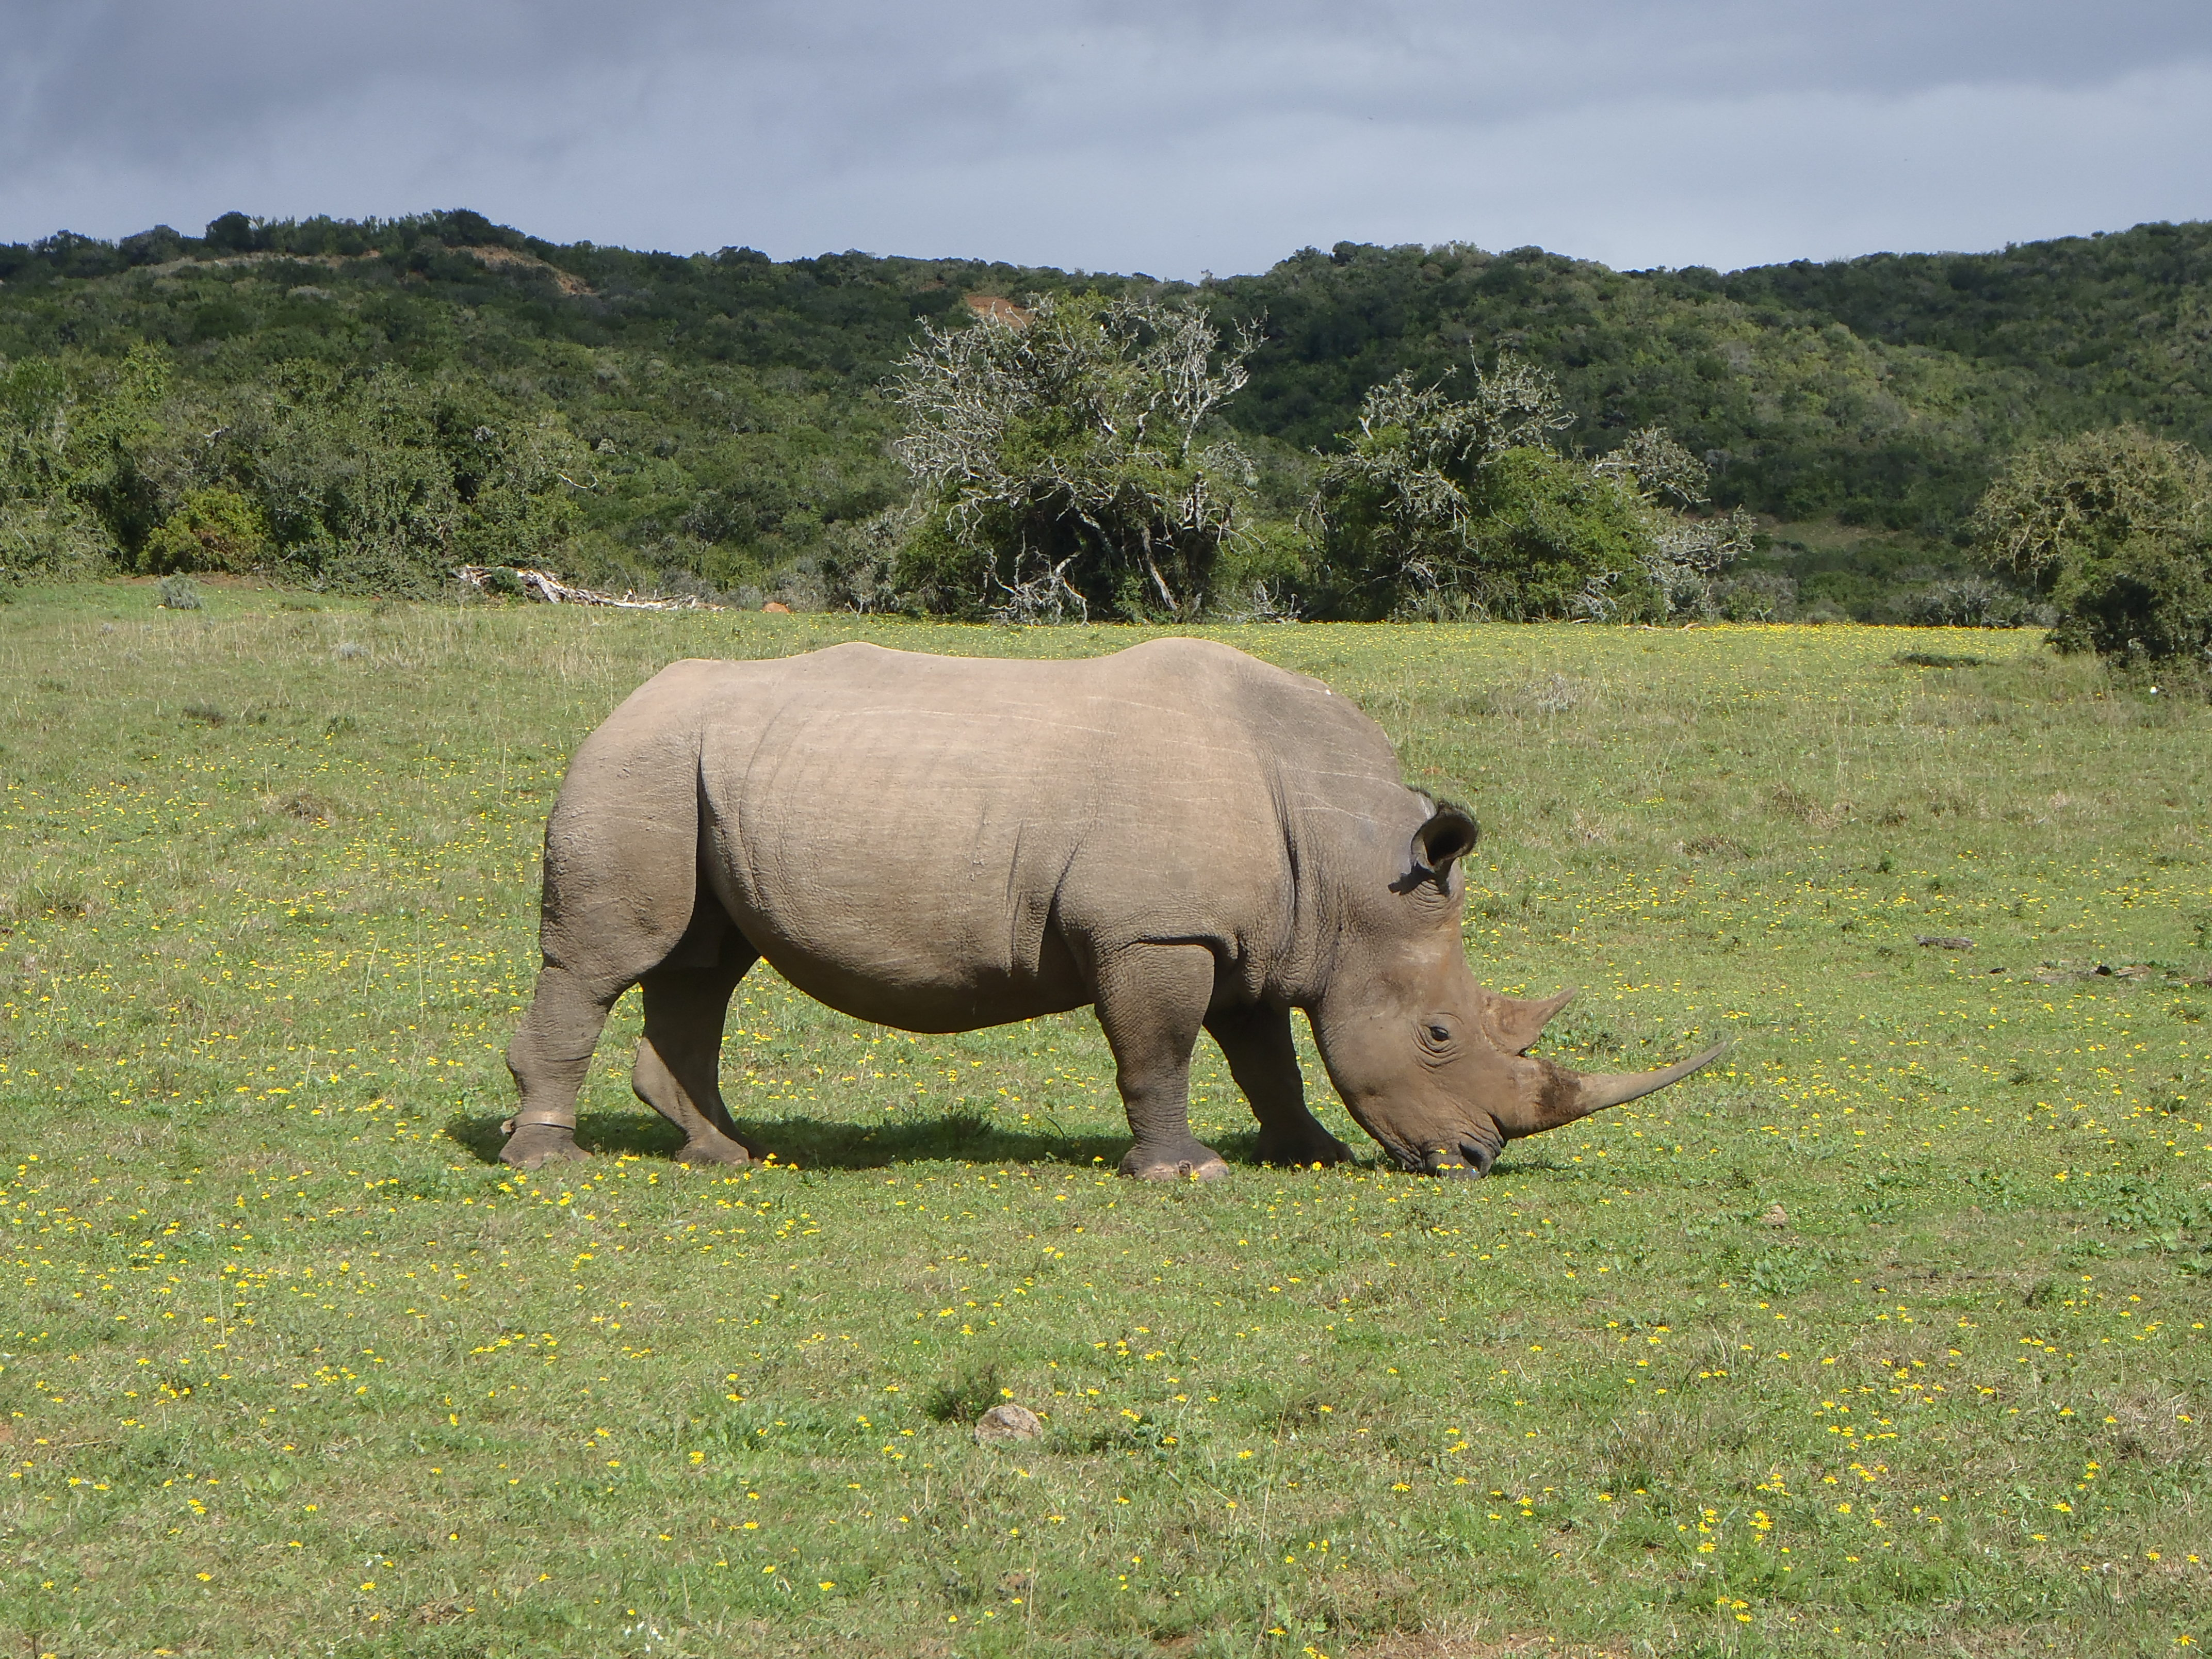 A rhino grazing on grass at the Shamwari